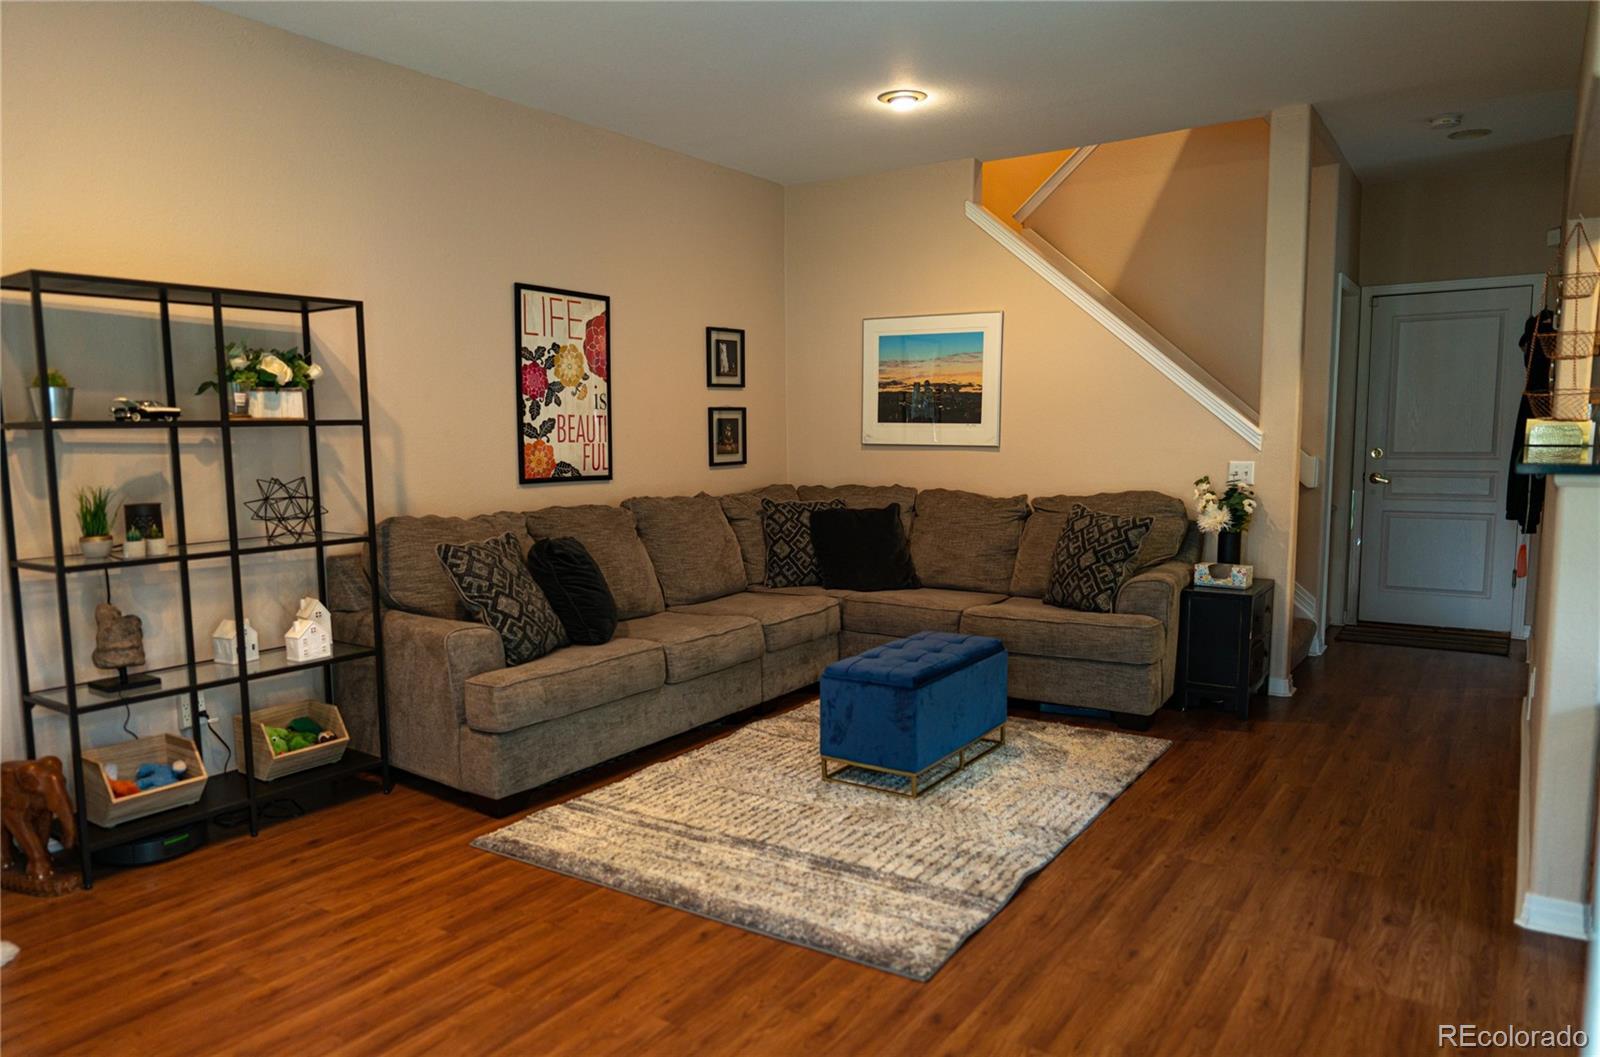 MLS# 3882850 - 3 - 5648 W Center Avenue, Lakewood, CO 80226